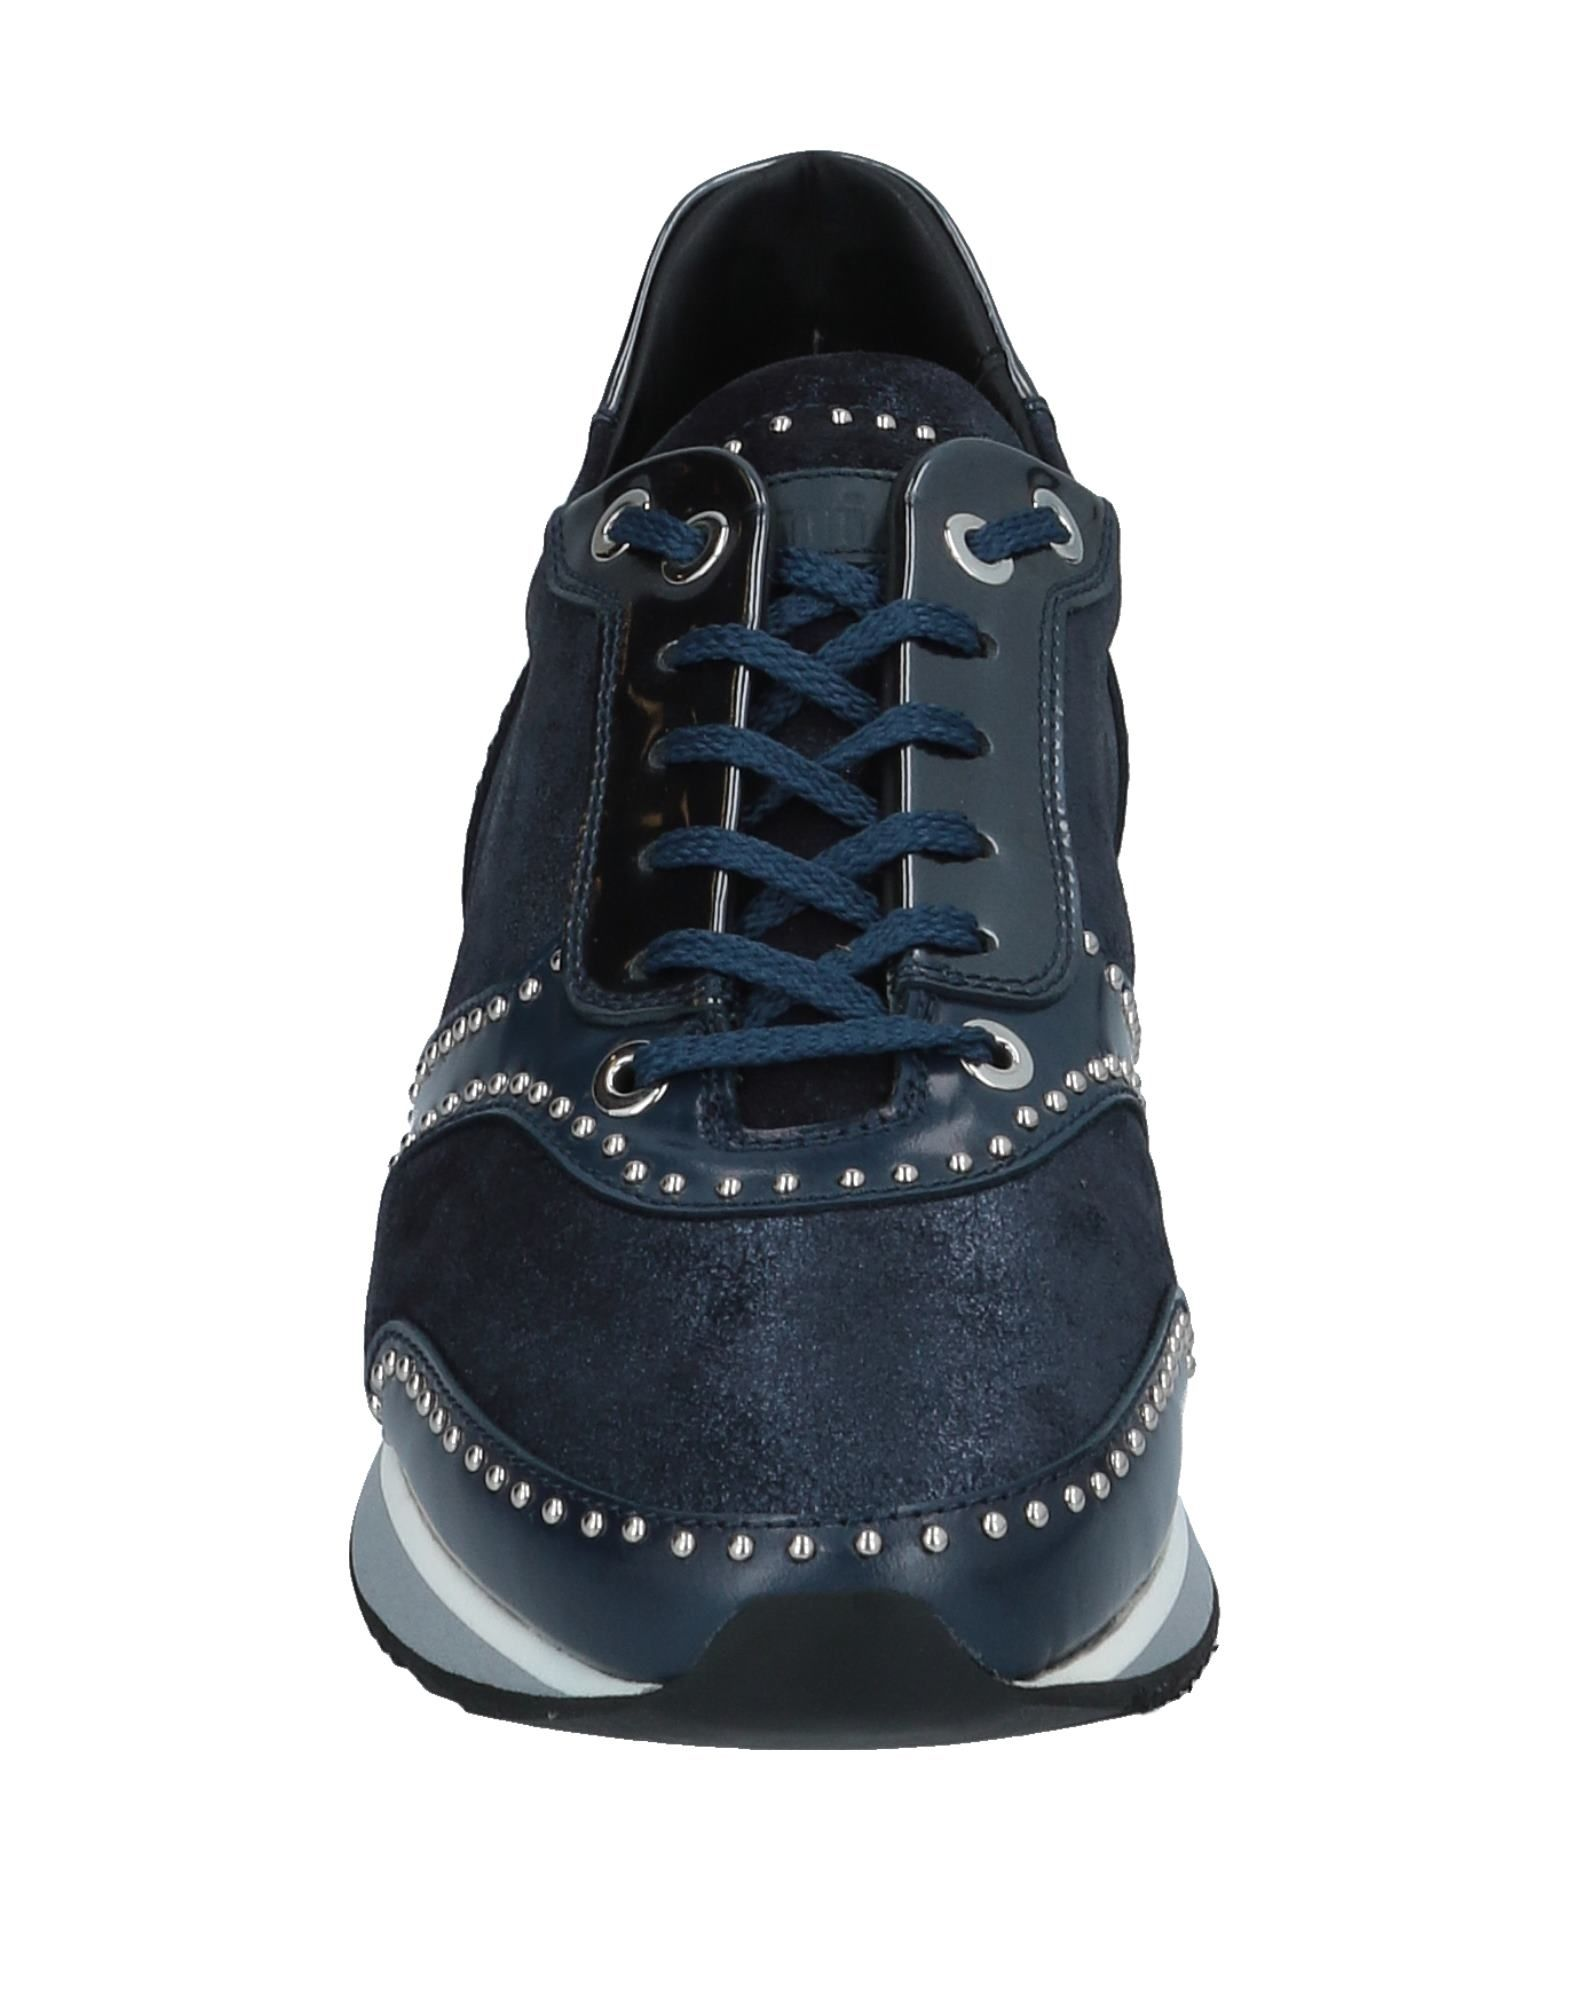 Stilvolle billige  Schuhe Pertini Sneakers Damen  billige 11535102PR 34054d